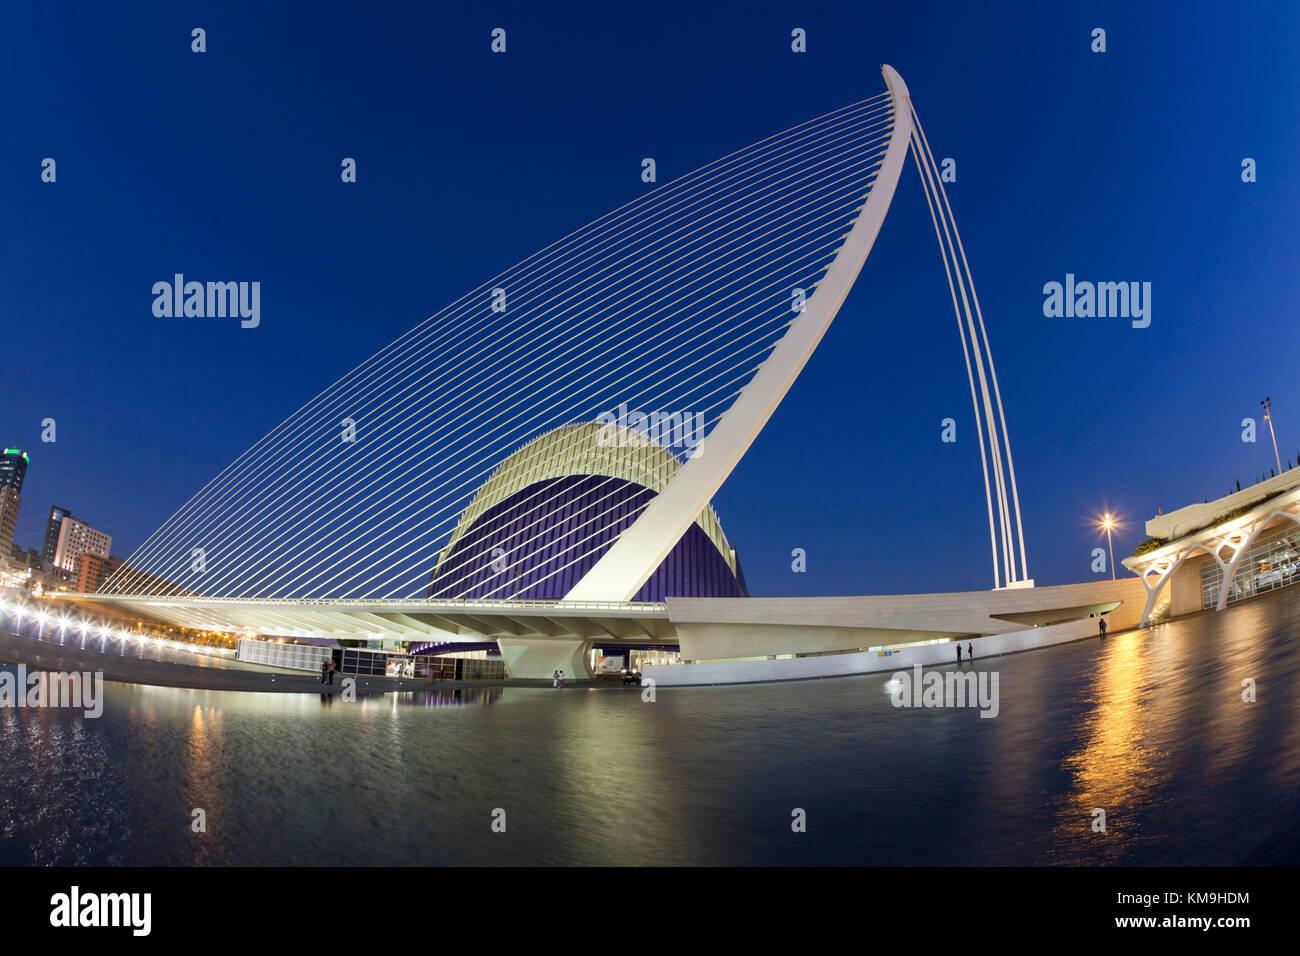 Agora, Puente de l Assut, bridge, City of sciences, Calatrava, Valencia, Spain - Stock Image